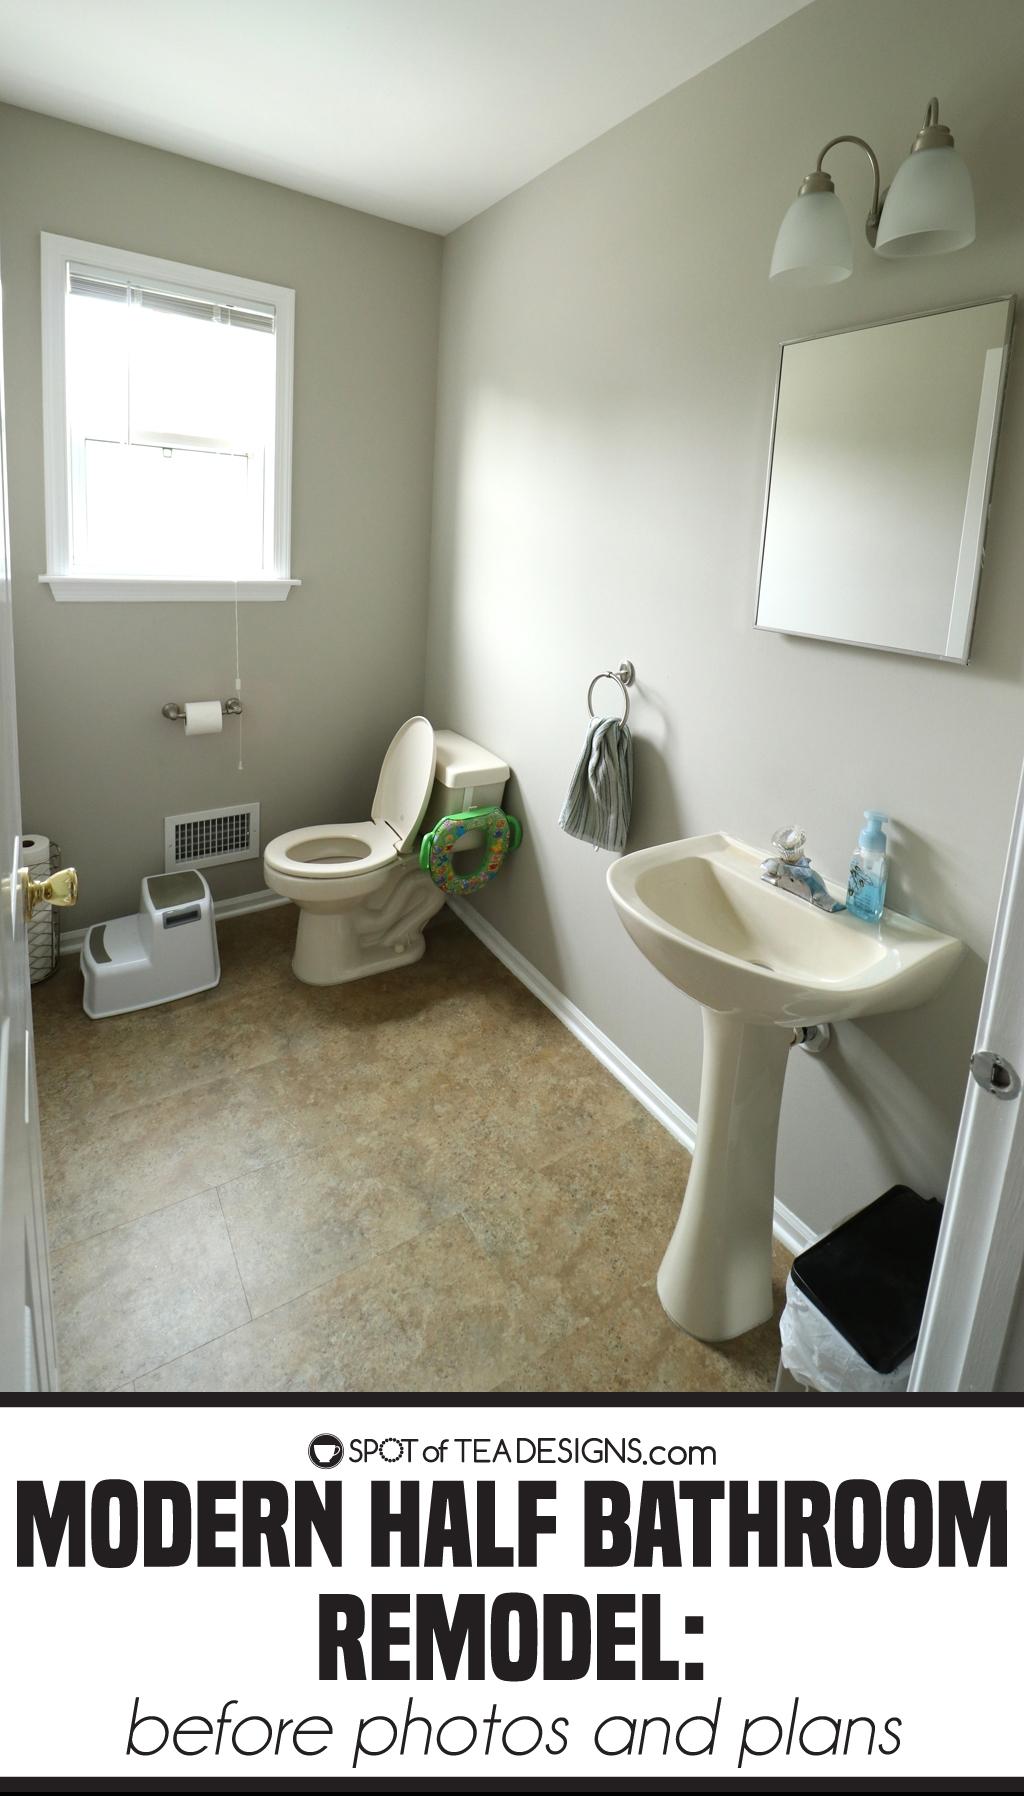 Modern Half Bathroom Remodel - Before photos | spotofteadesigns.com